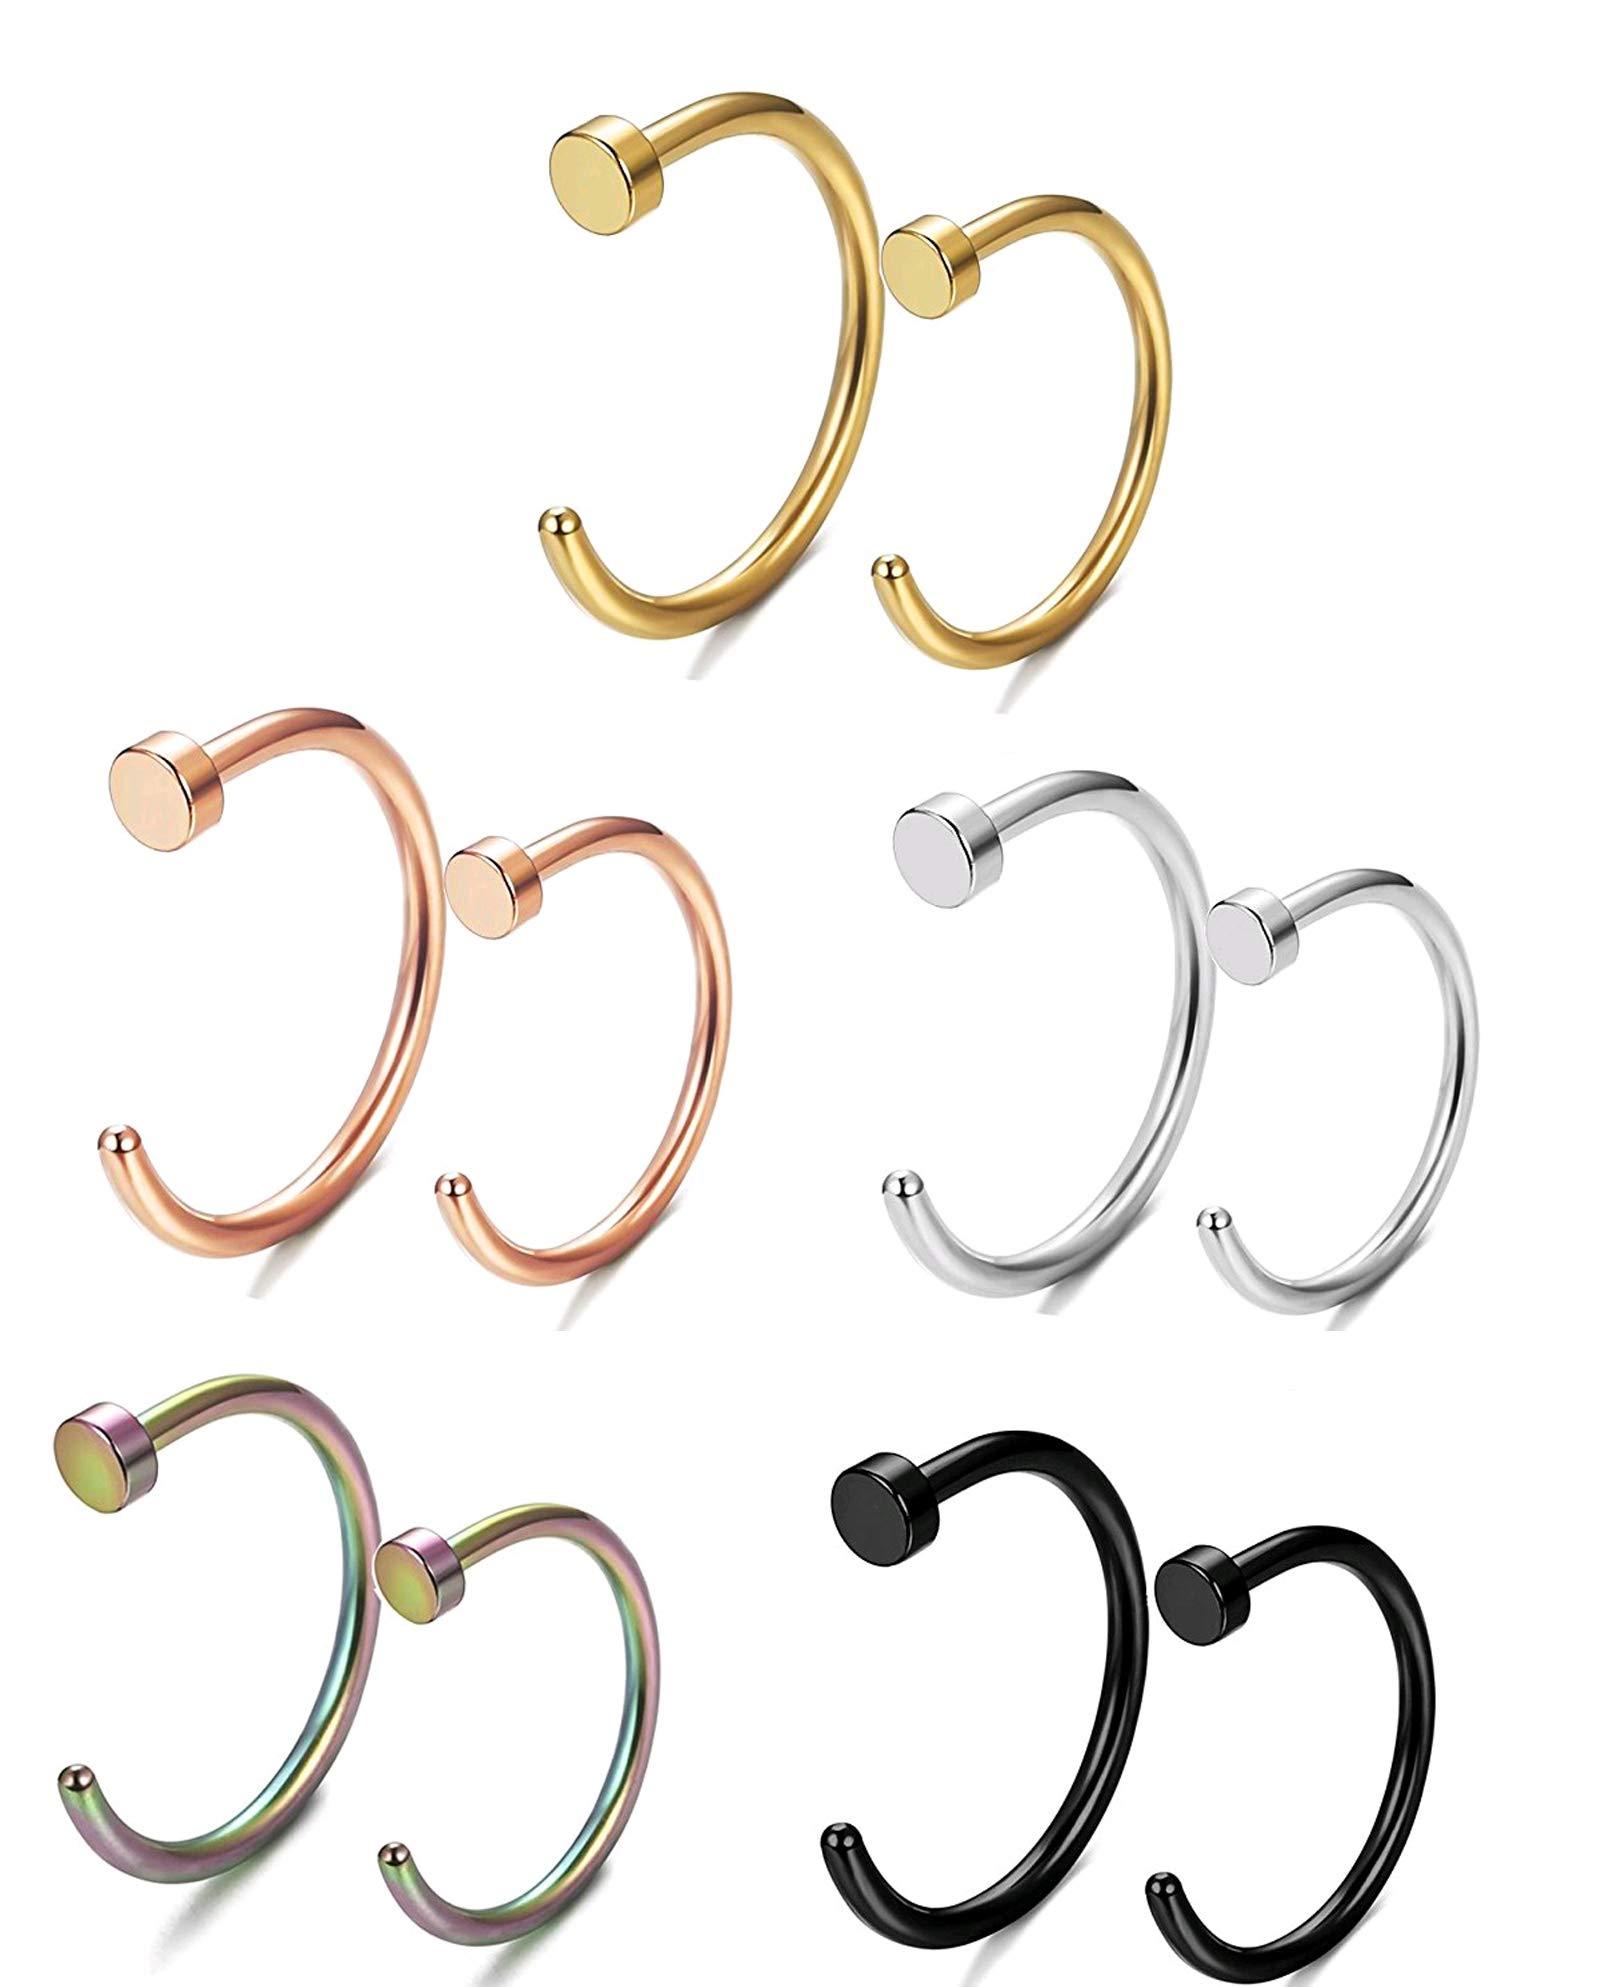 Fystir 18g Nose Rings For Women Men Small Nose Hoop Ring Rose Gold